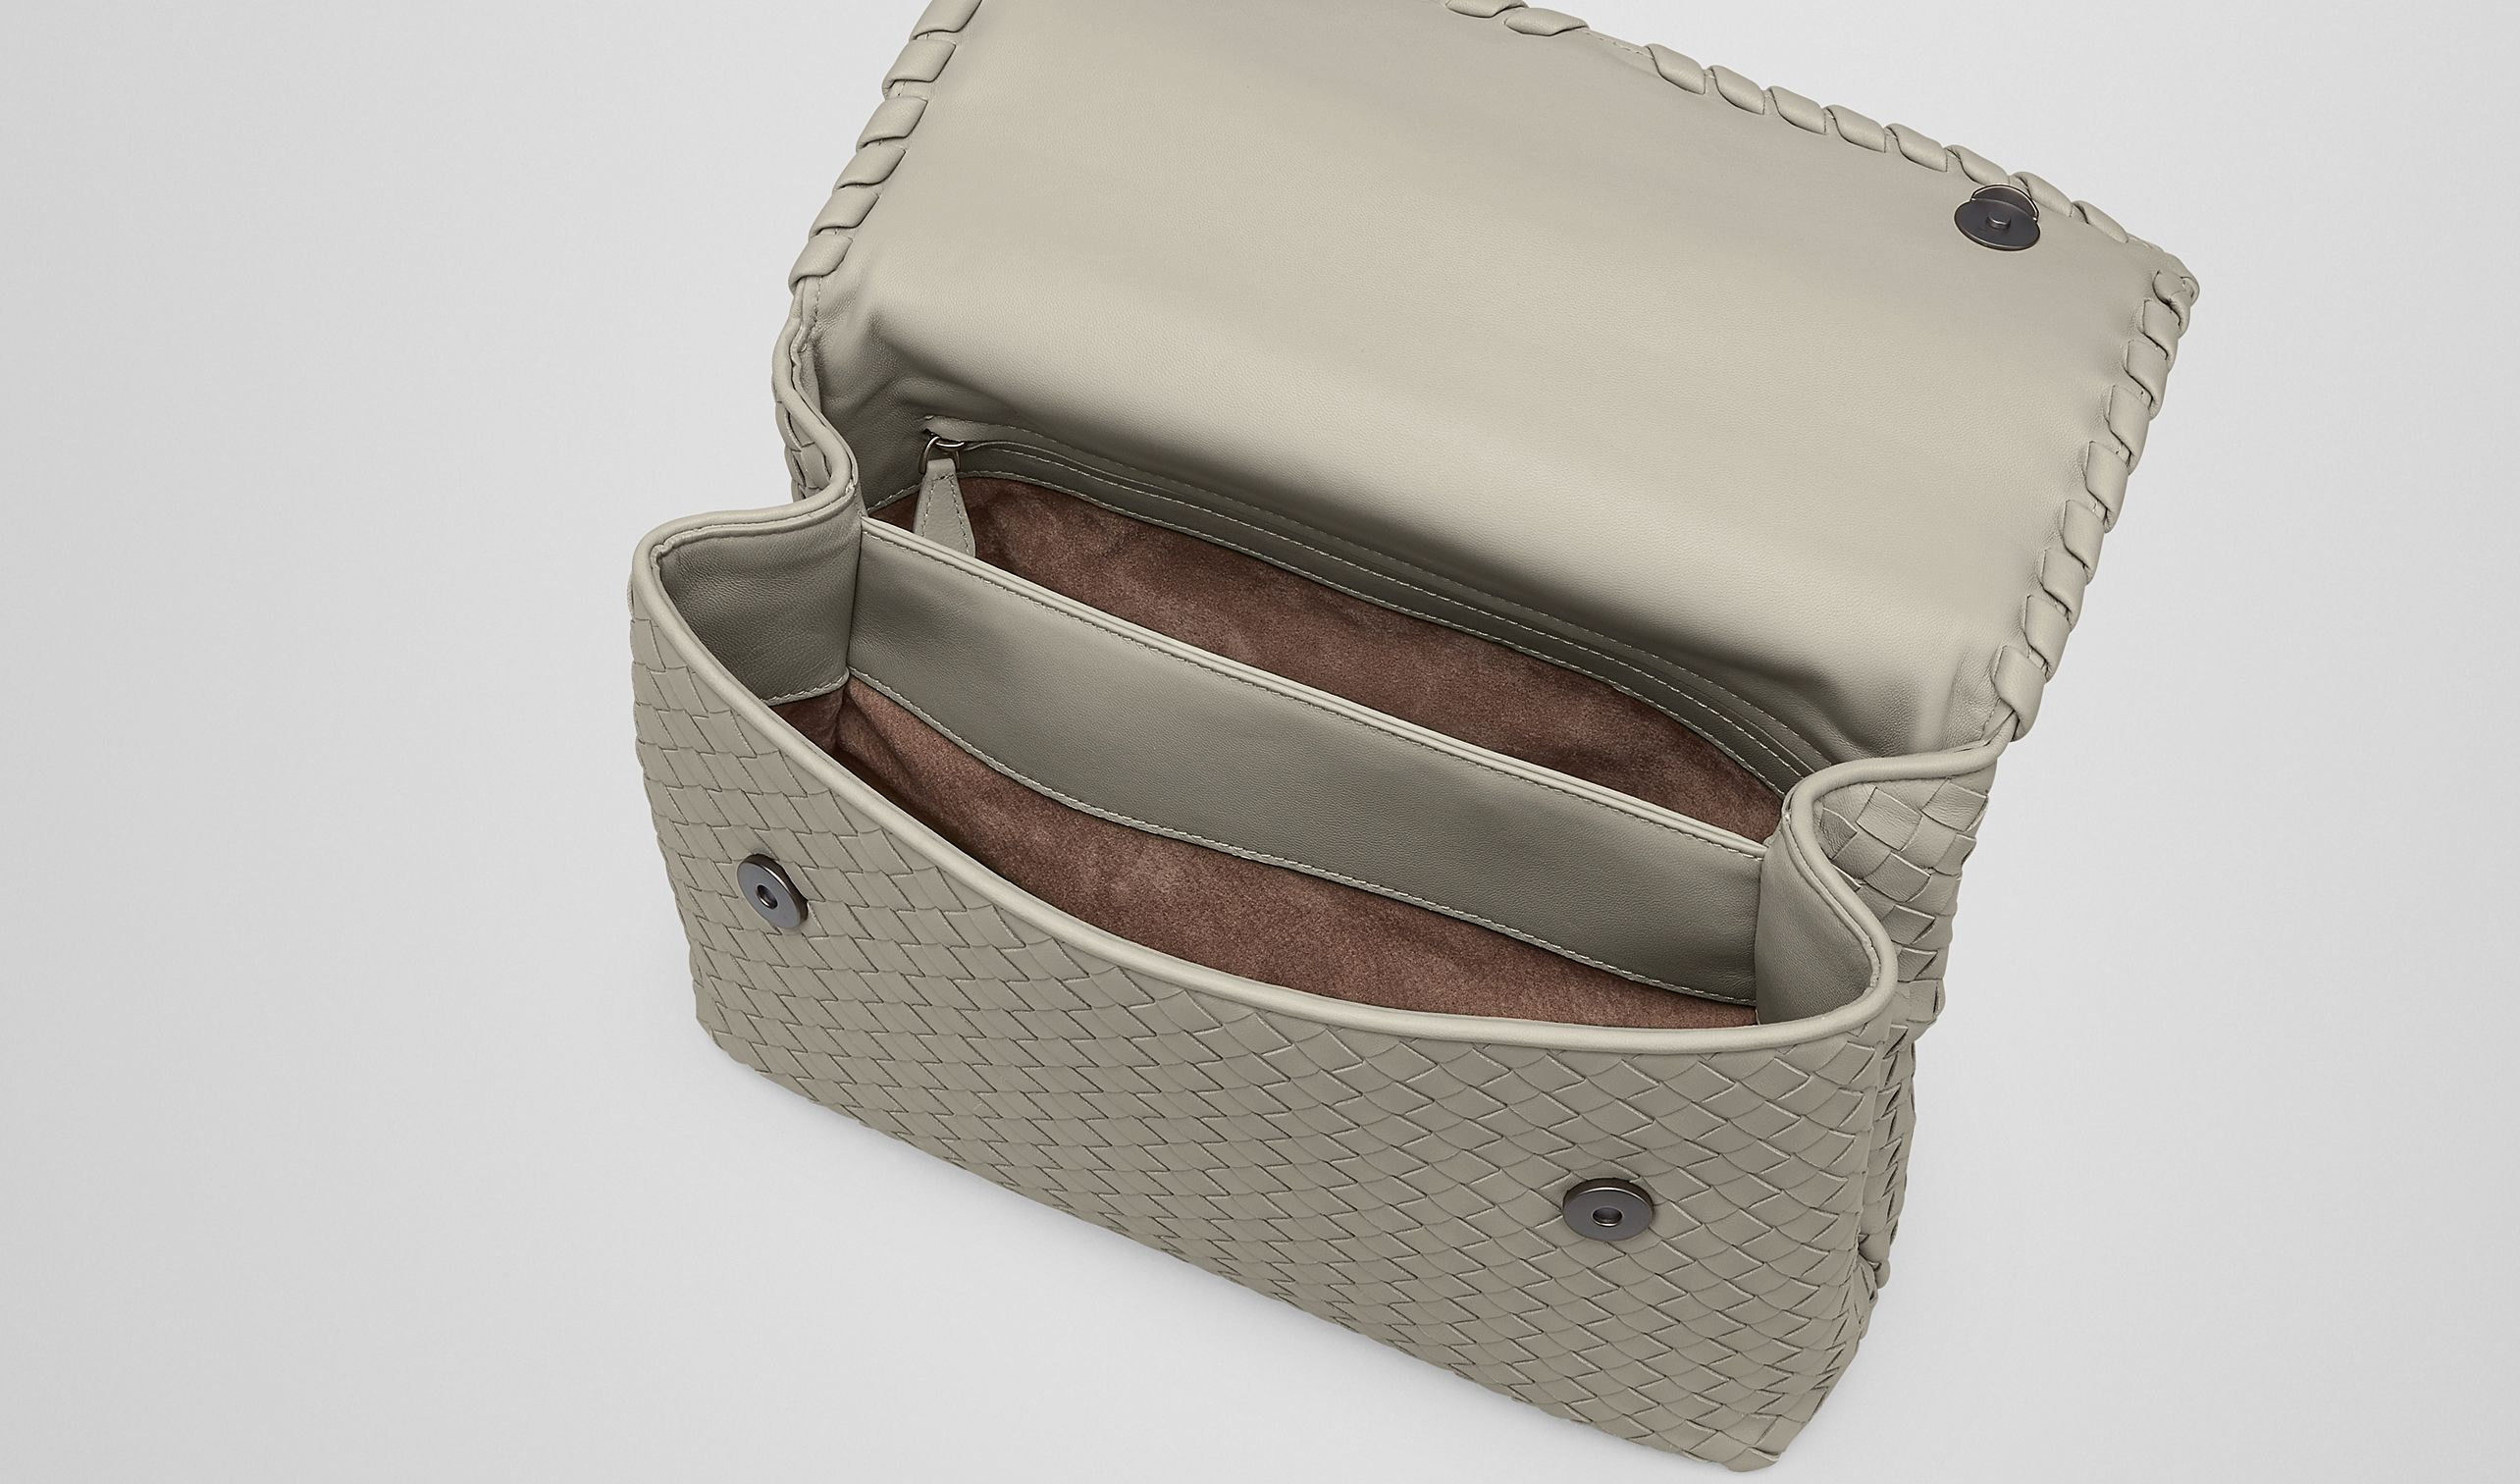 Bottega Veneta®|Tourmaline Intrecciato Nappa Olimpia Bag|Shoulder or hobo bag |Bags